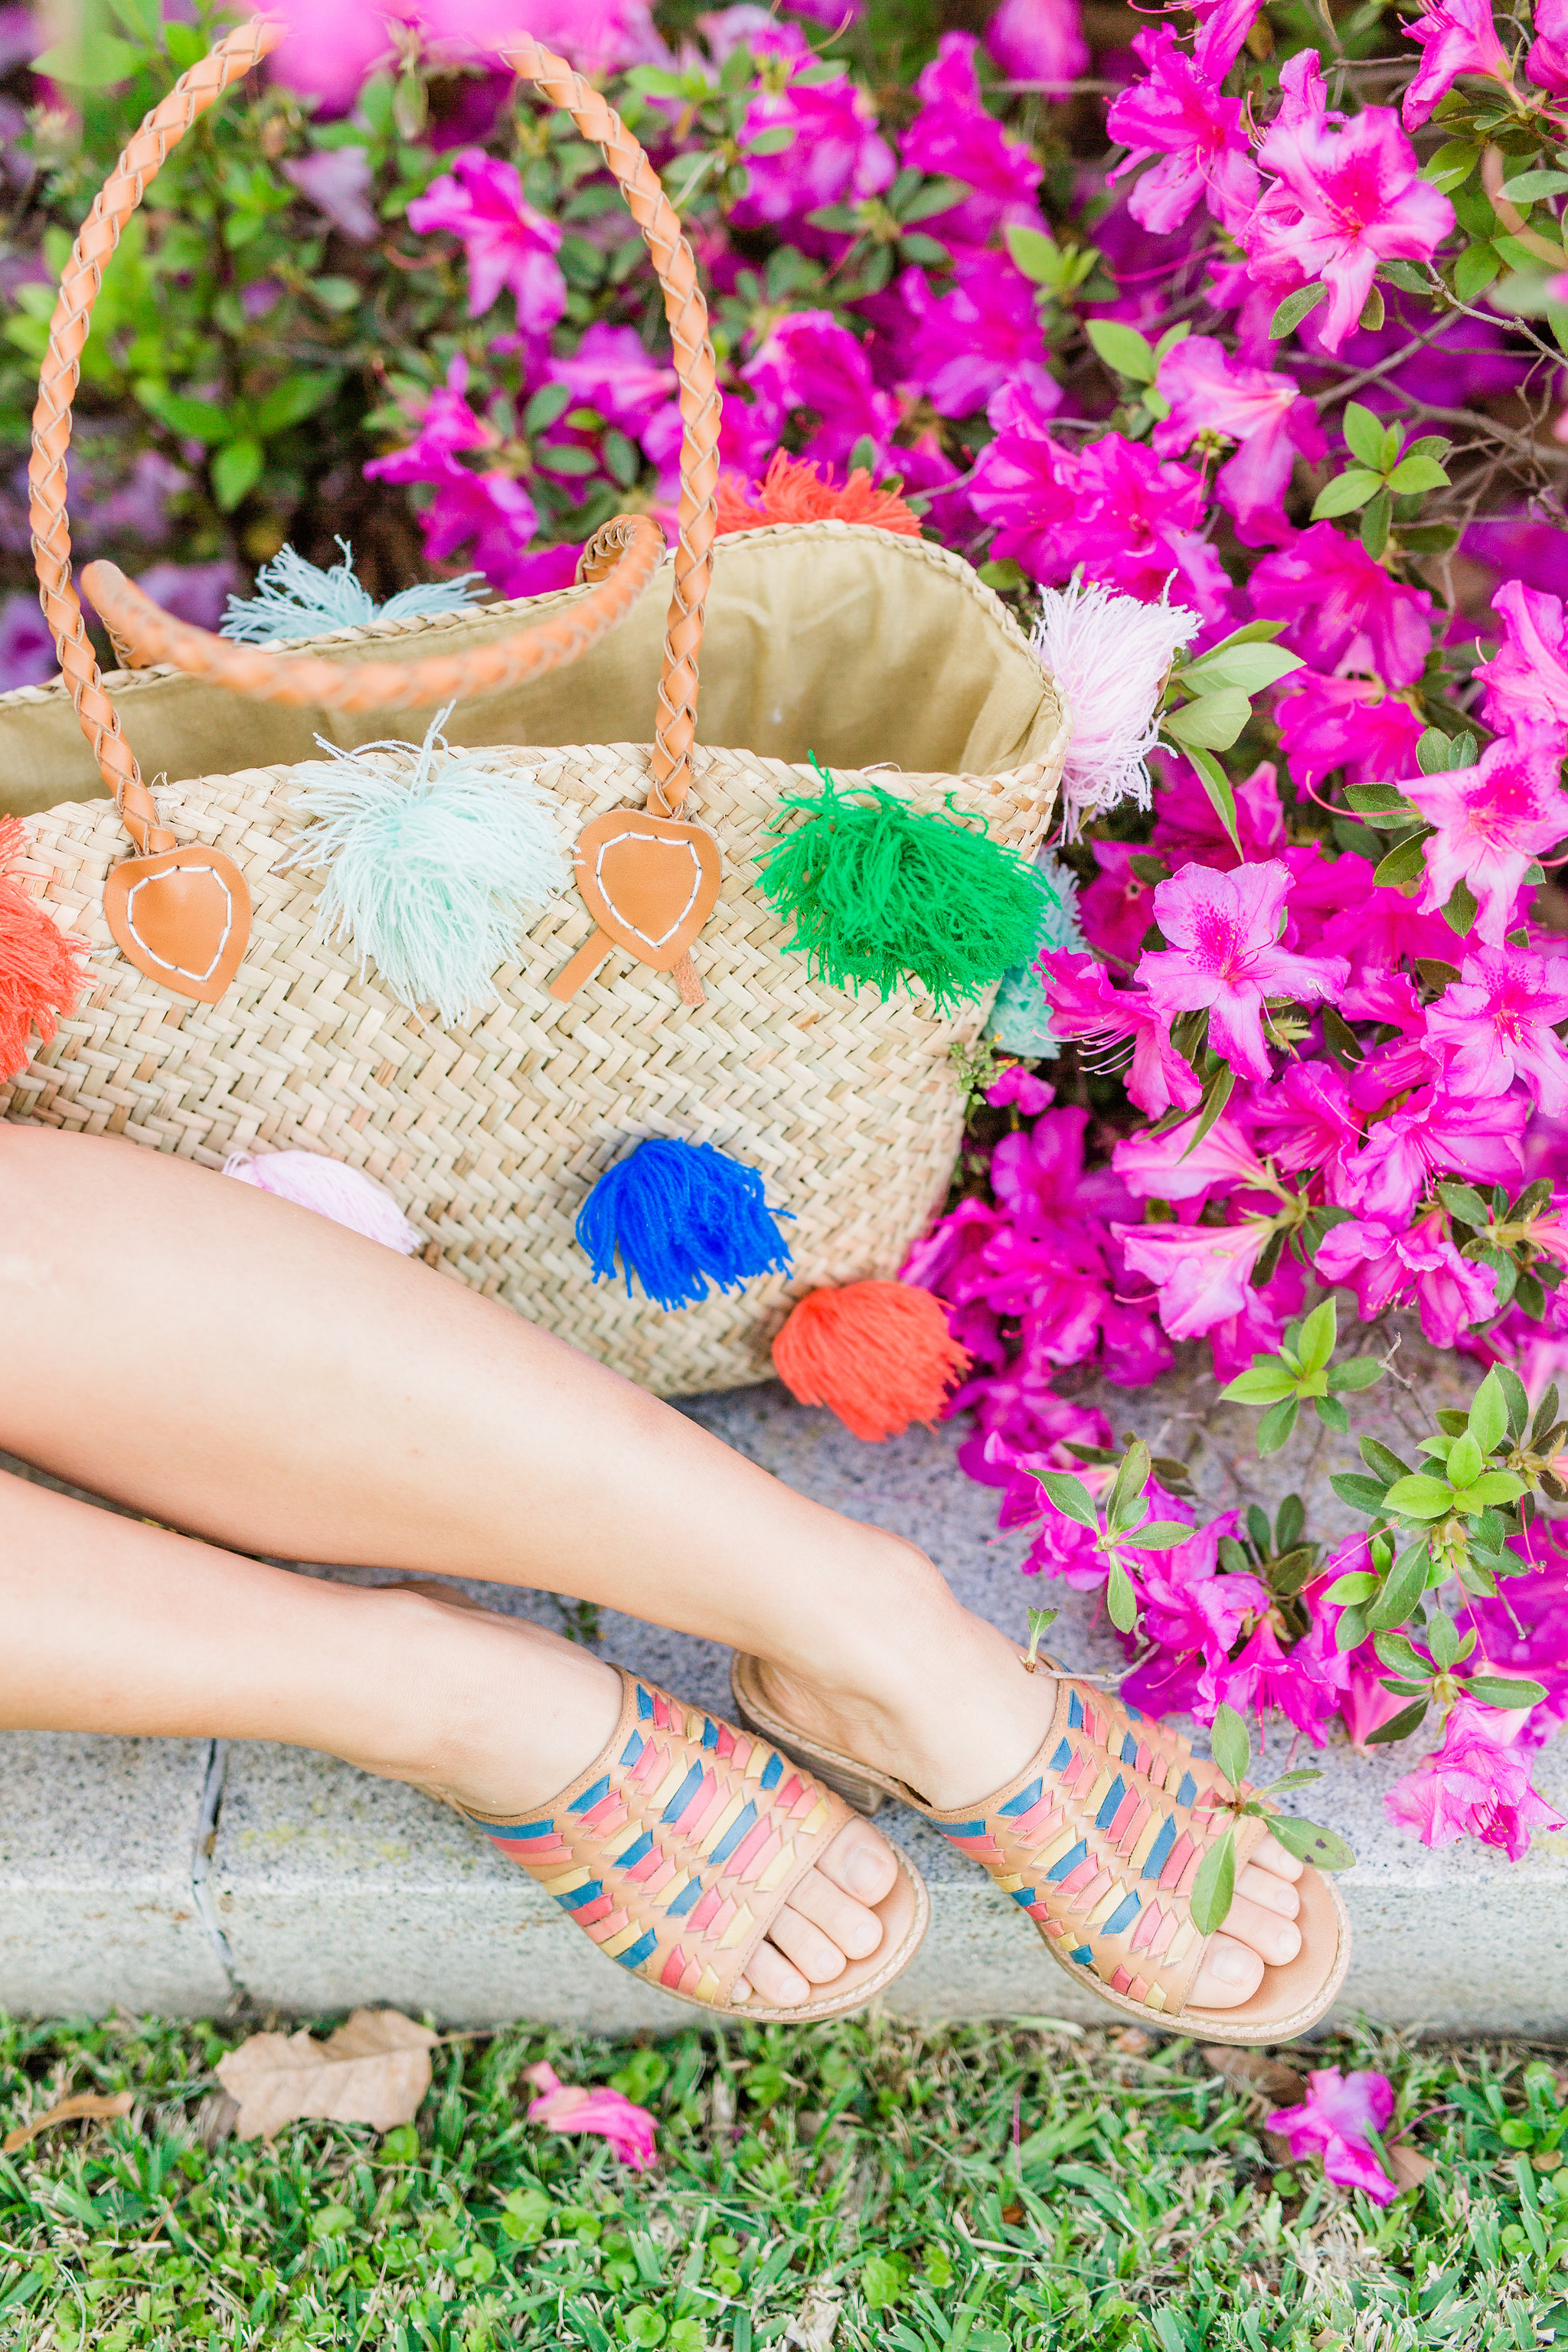 Joyfullygreen Comfortiva Brileigh Houston Azalea Trail Photoshoot. Pom Pom bag rainbow sandals 1.jpg